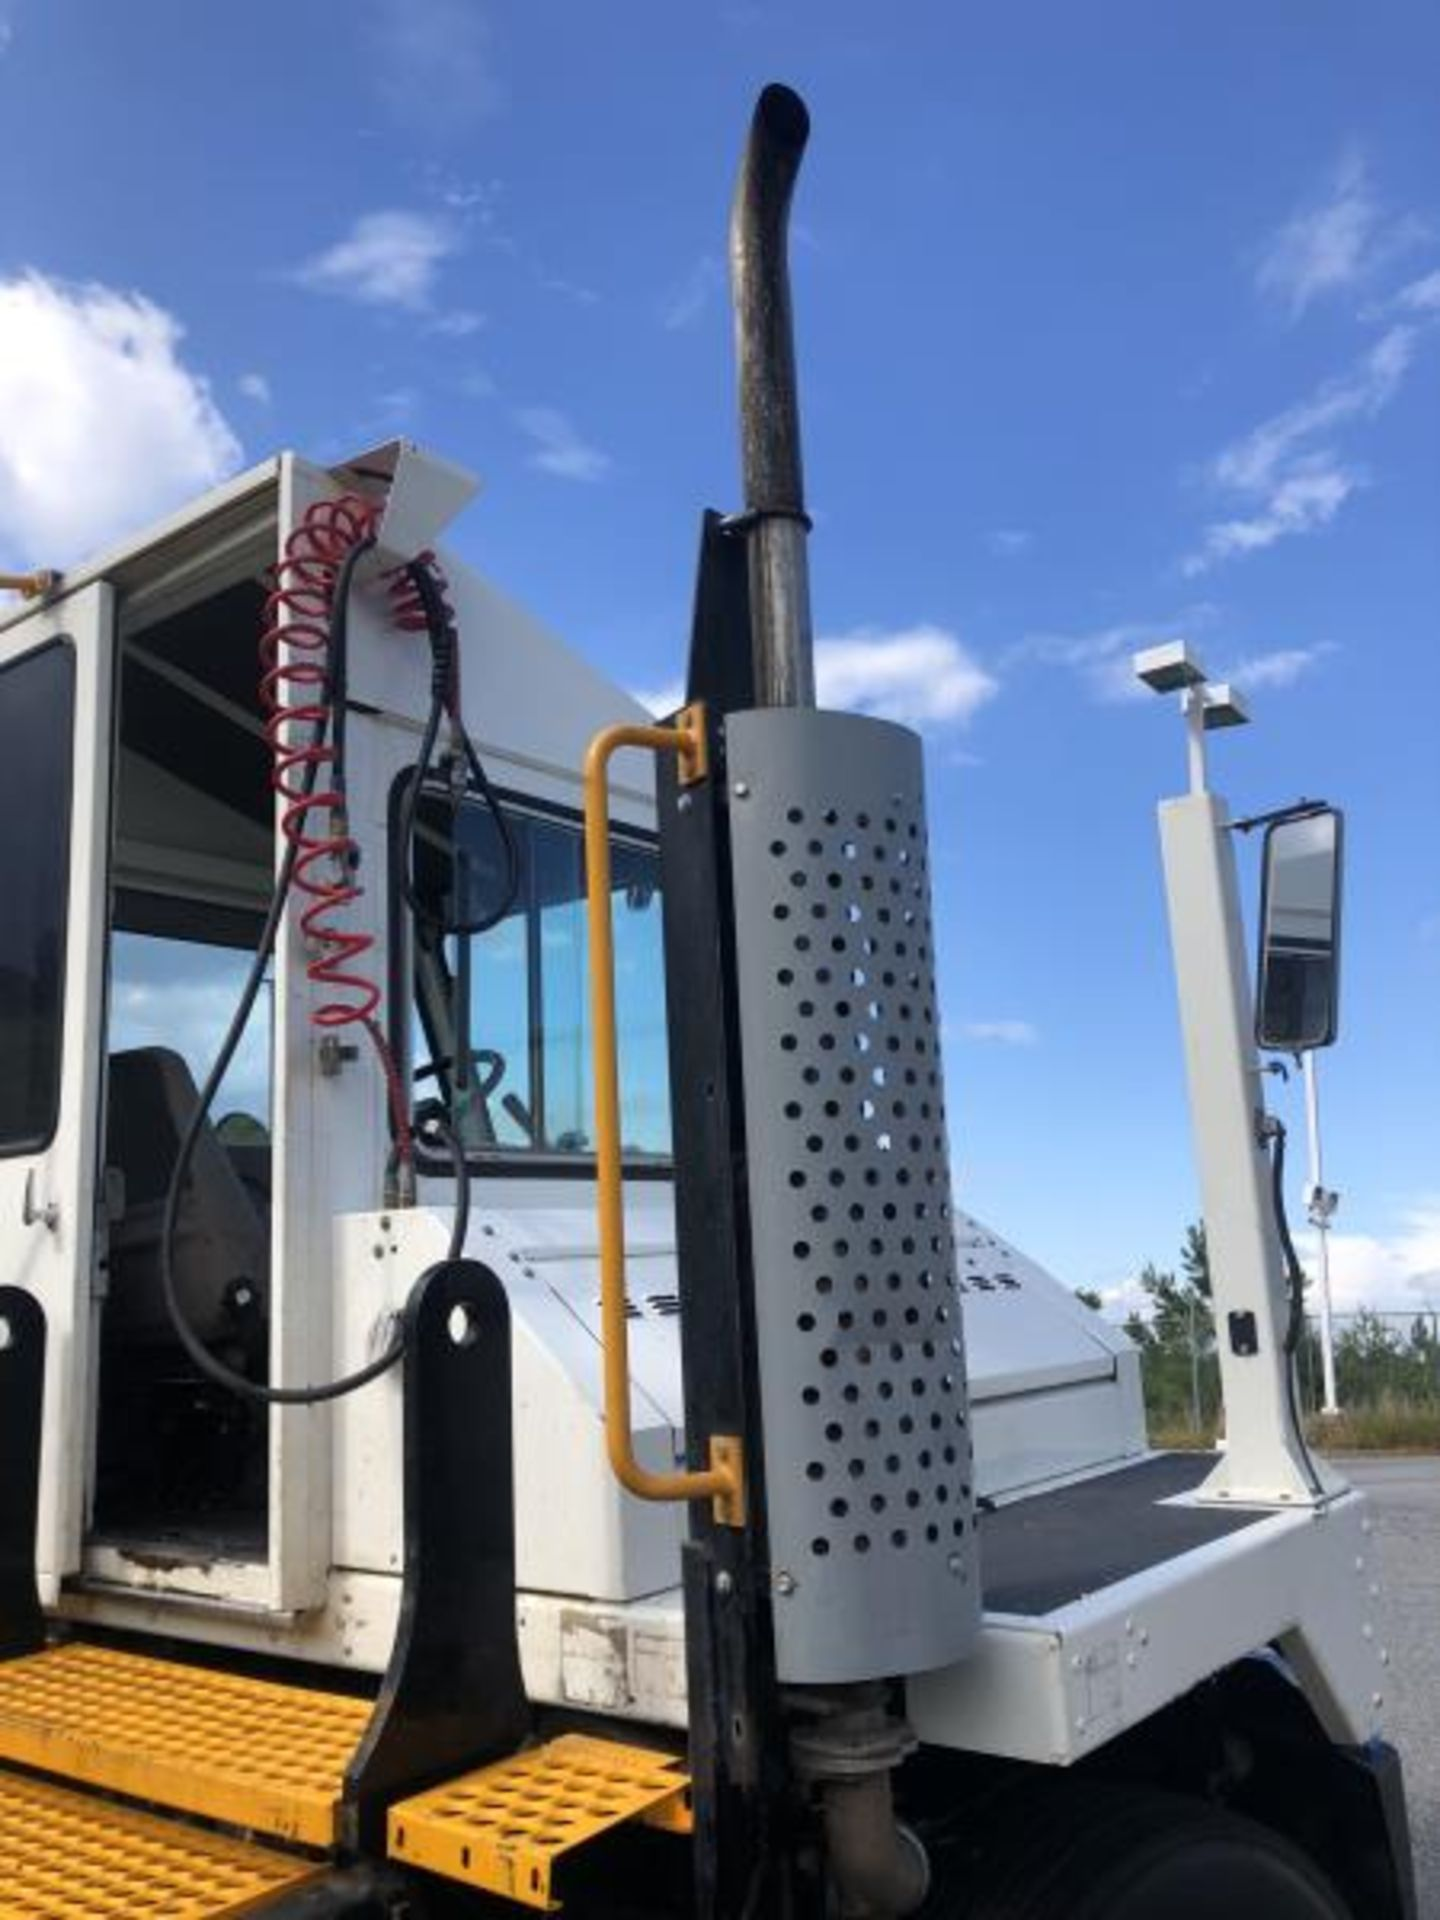 2015 Kalmar Ottawa 4x2 Yard Truck , SN: 338837 3,239.3 Hours, 3,125 Miles - Image 15 of 32